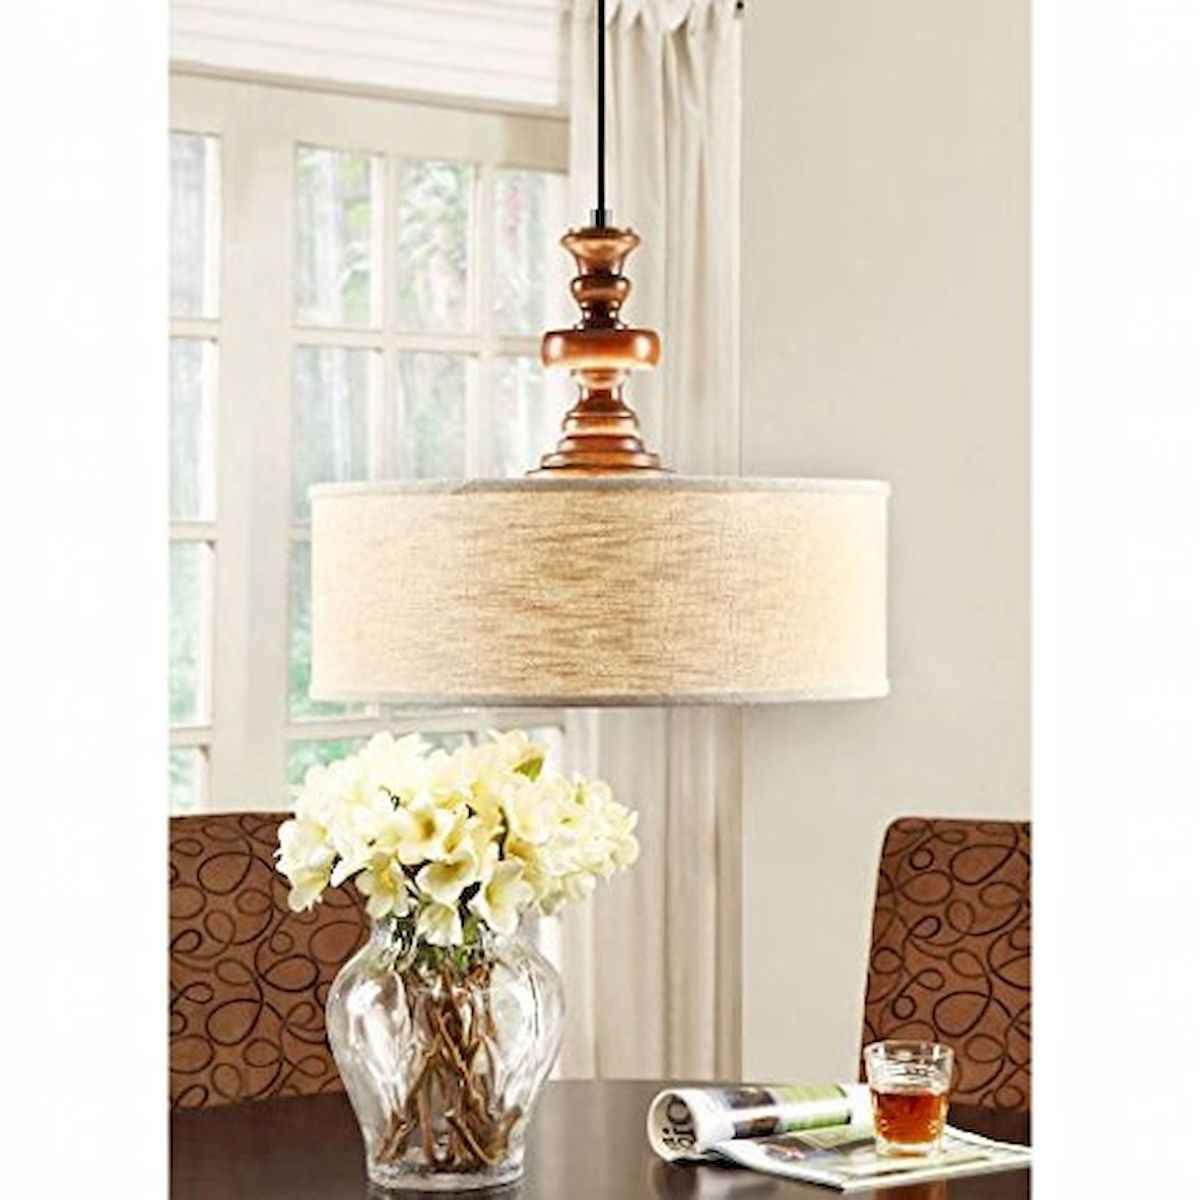 60 Farmhouse Living Room Lighting Ideas Decor And Design (7)